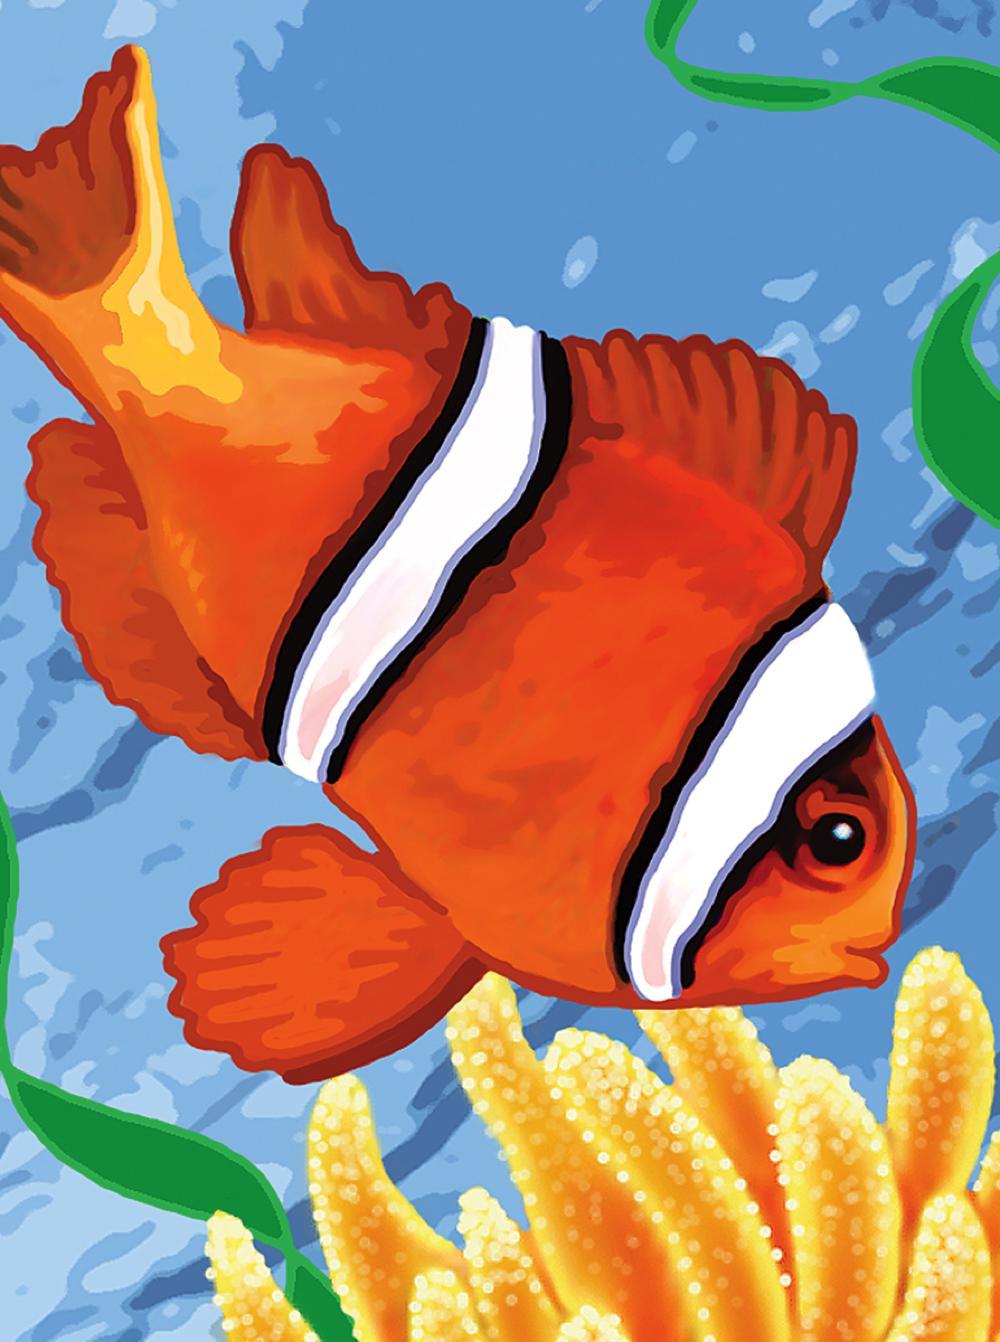 Peinture num ros poisson clown club jouet achat de for Achat poisson clown